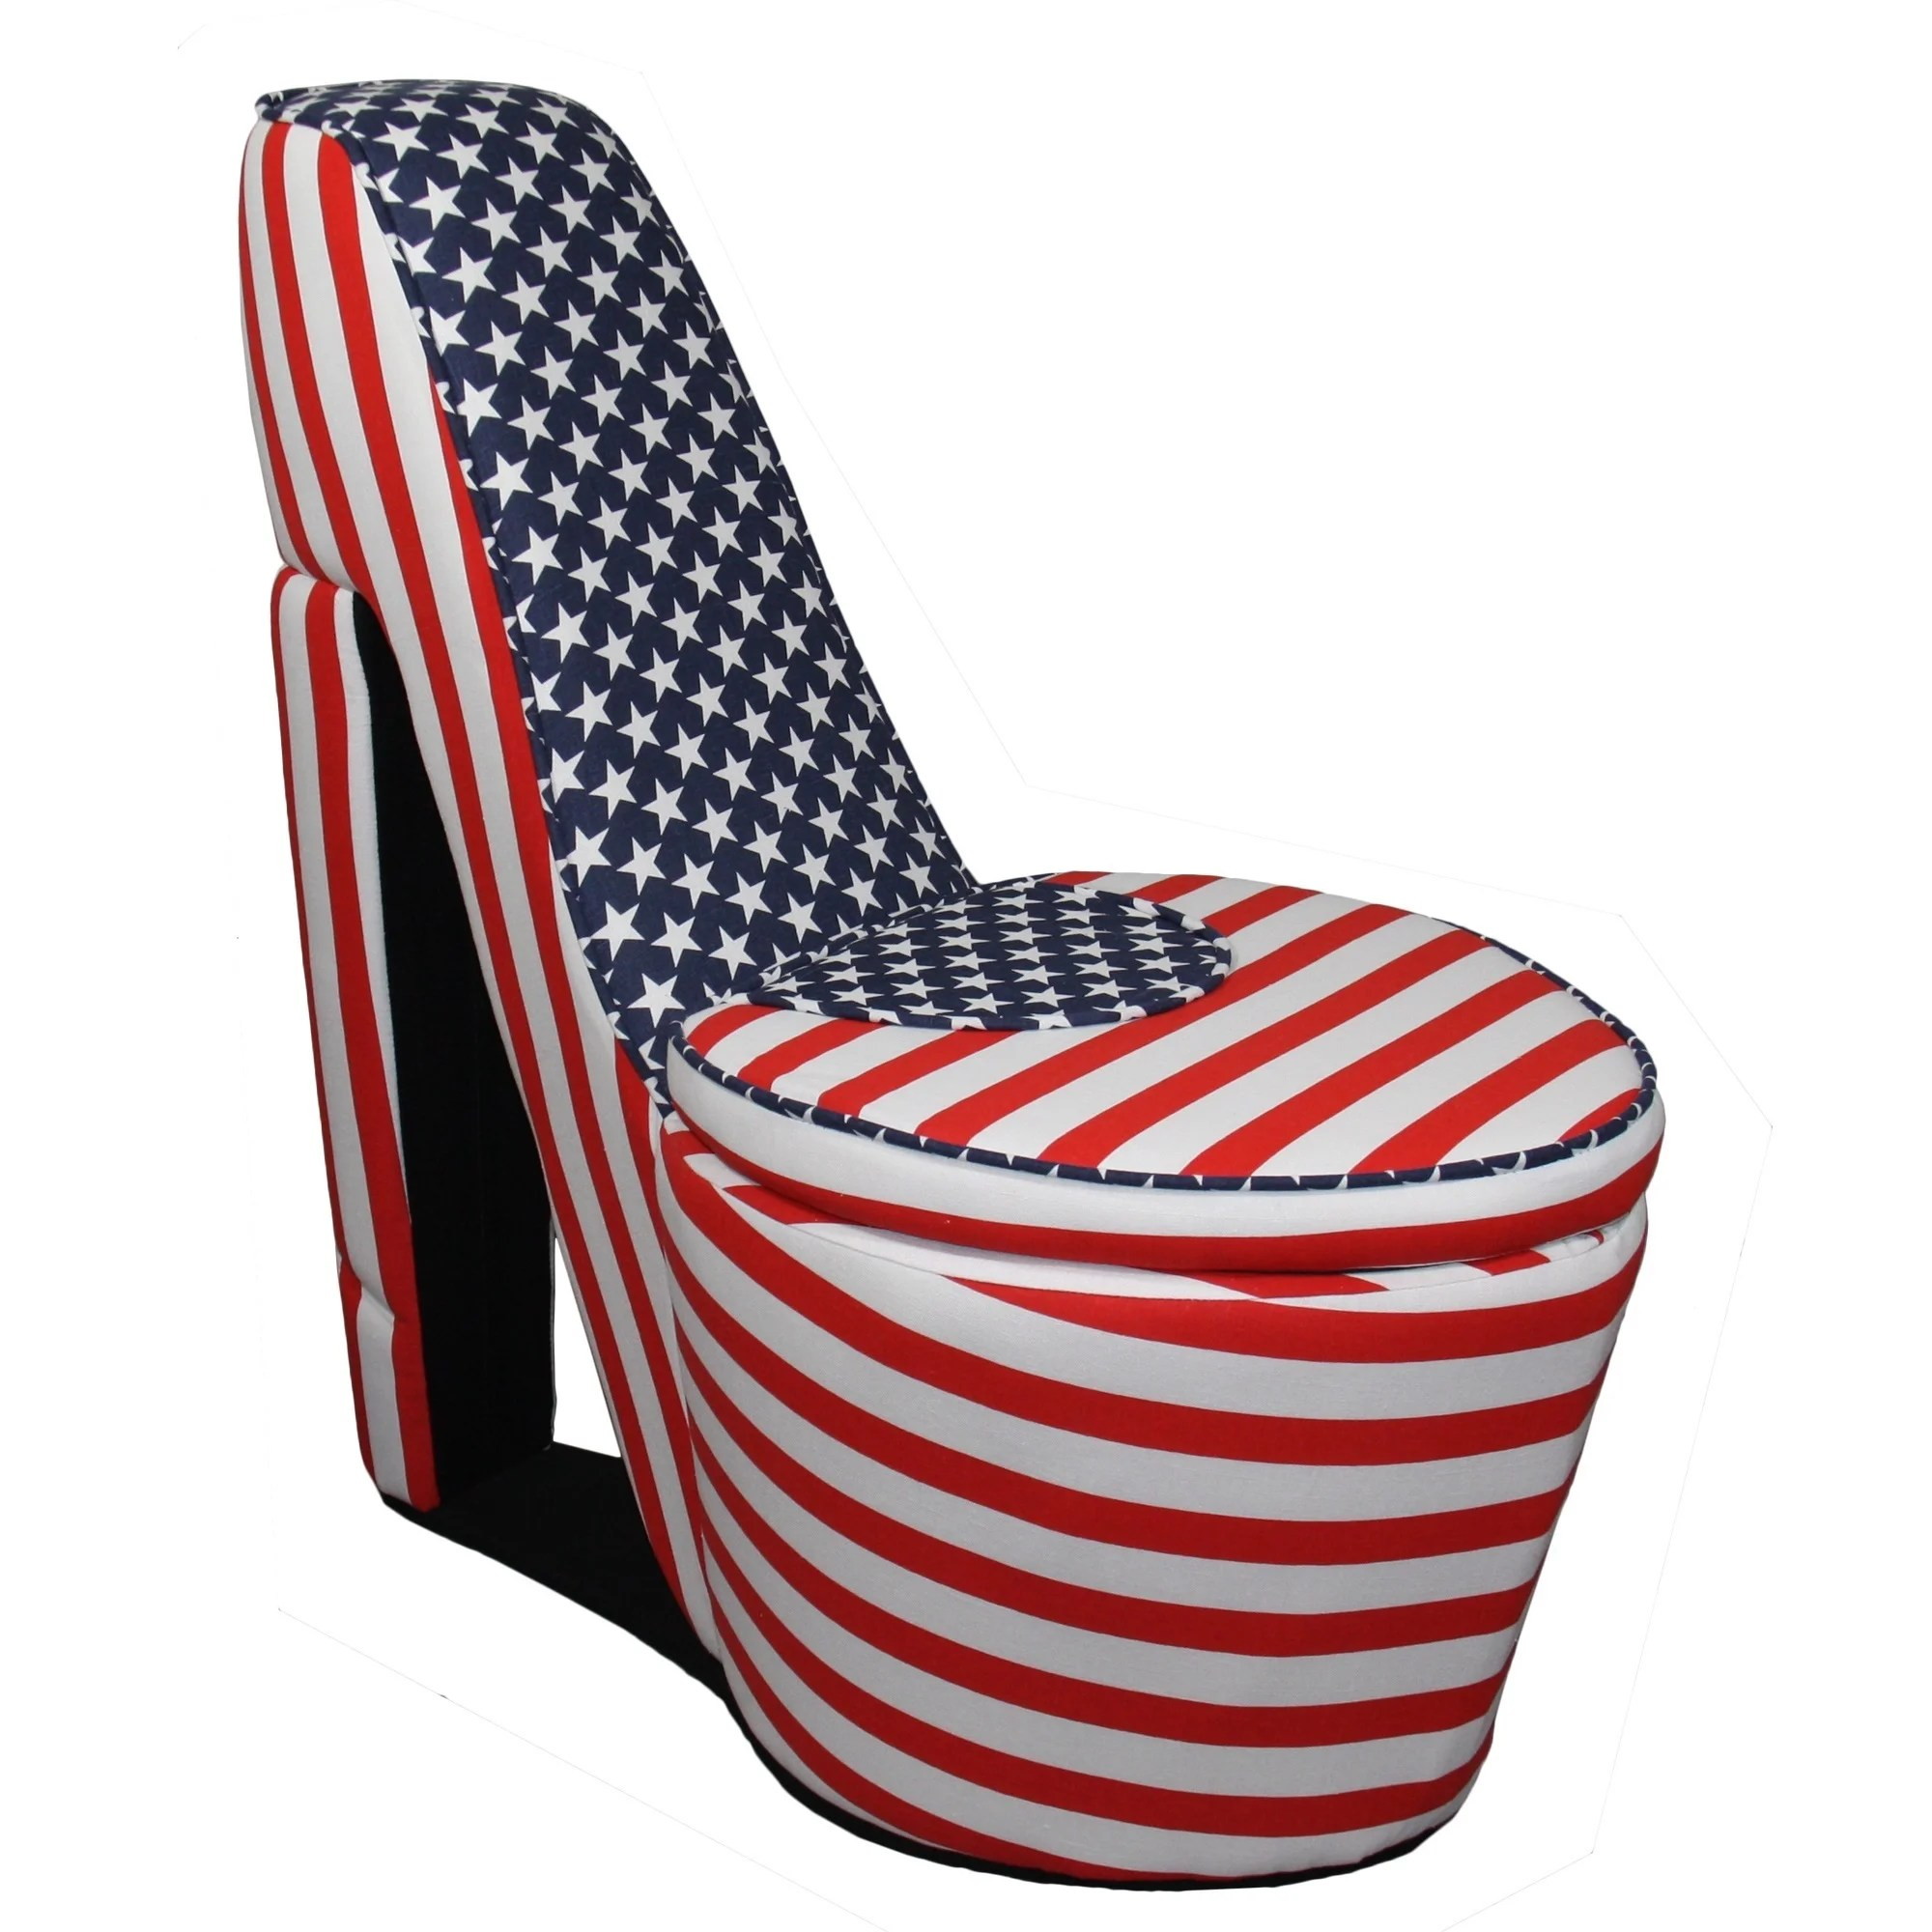 american flag chair nail salon chairs pink high heels storage ebay